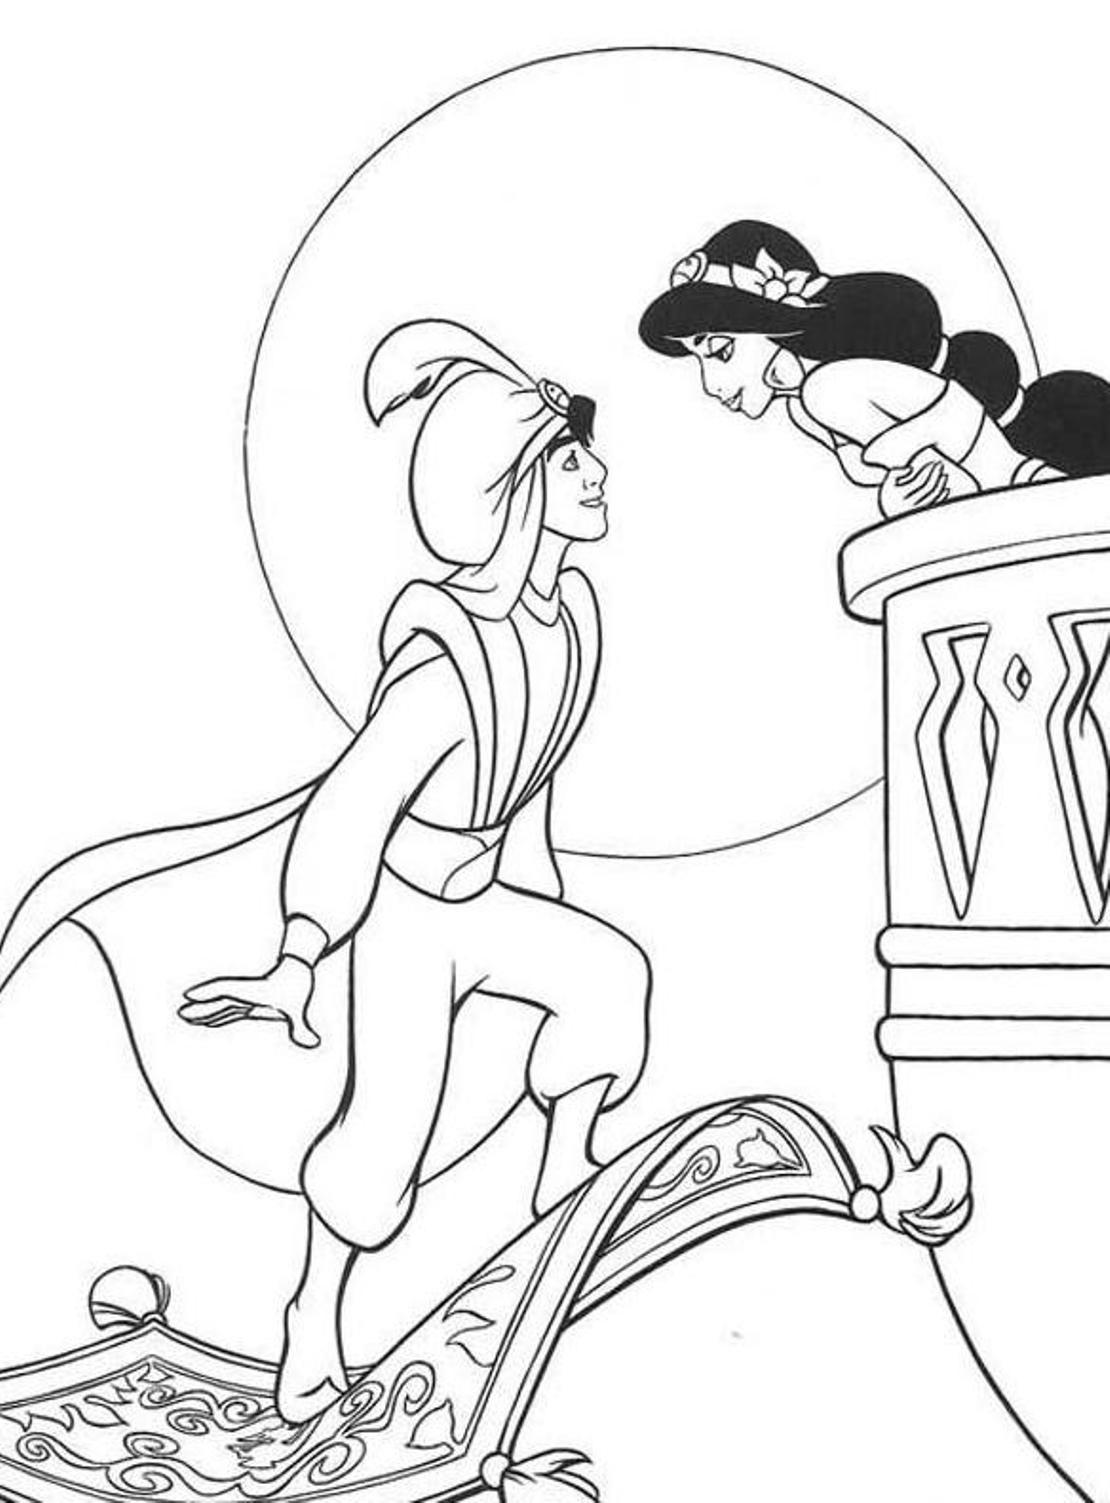 Download Aladdin Coloring Pages Jasmine Disney Or Print Aladdin ...